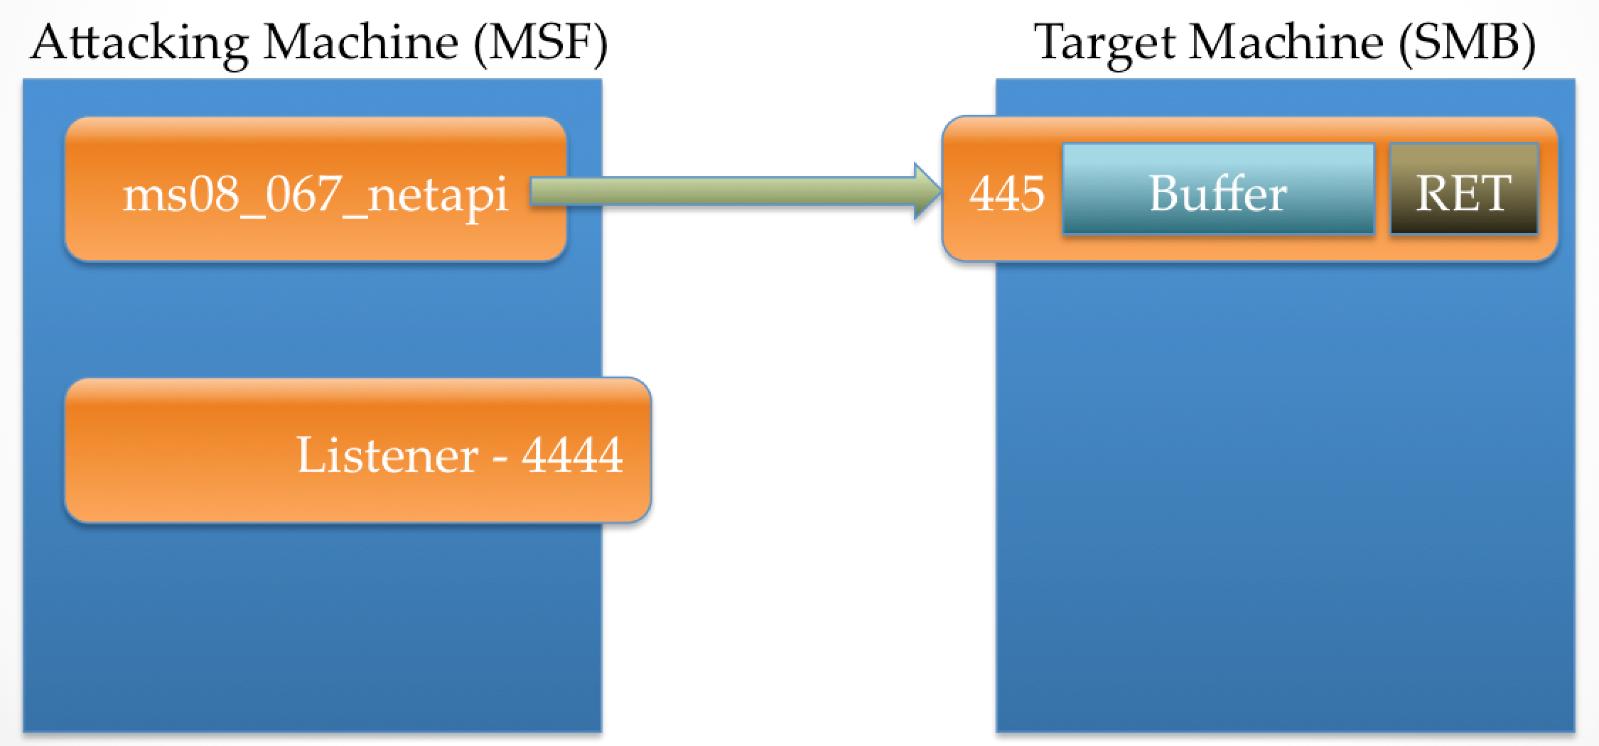 Meterpreter Stageless Mode · rapid7/metasploit-framework Wiki · GitHub